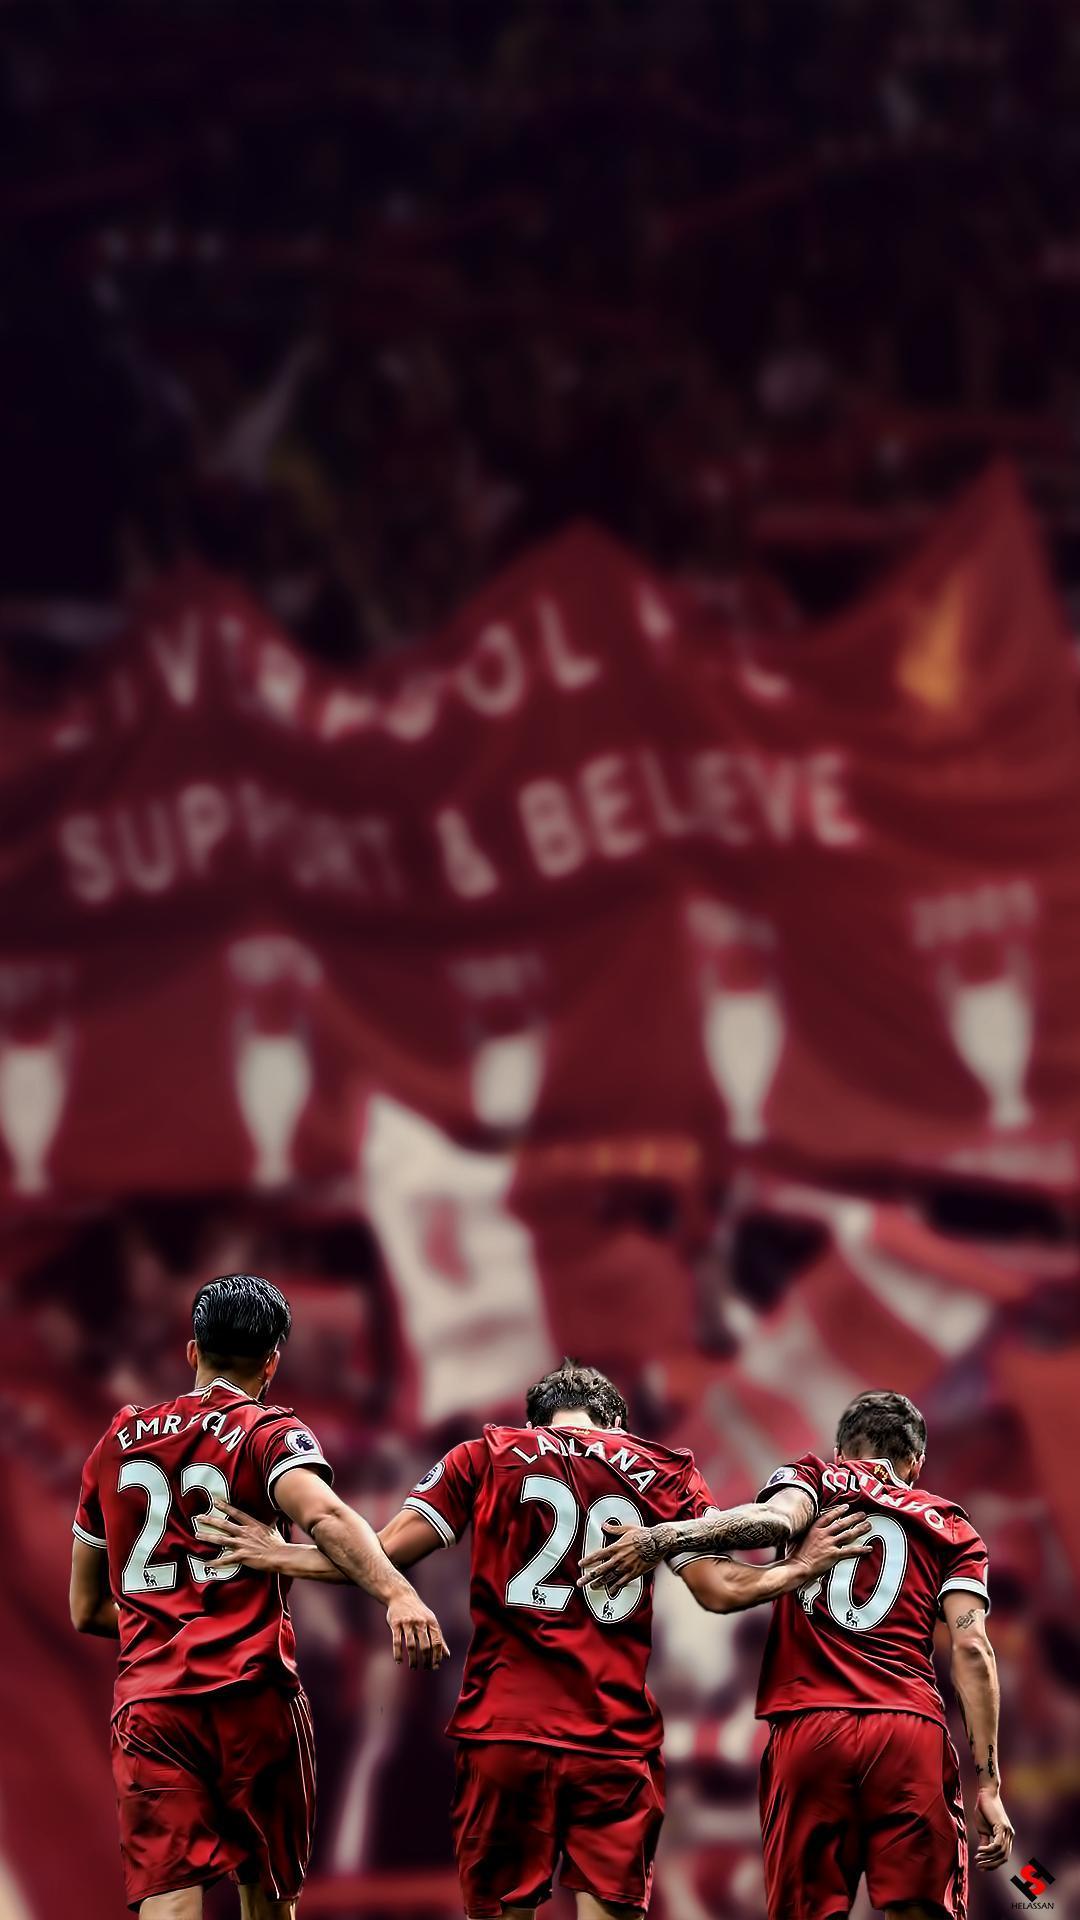 Liverpool 2020 Wallpapers Wallpaper Cave